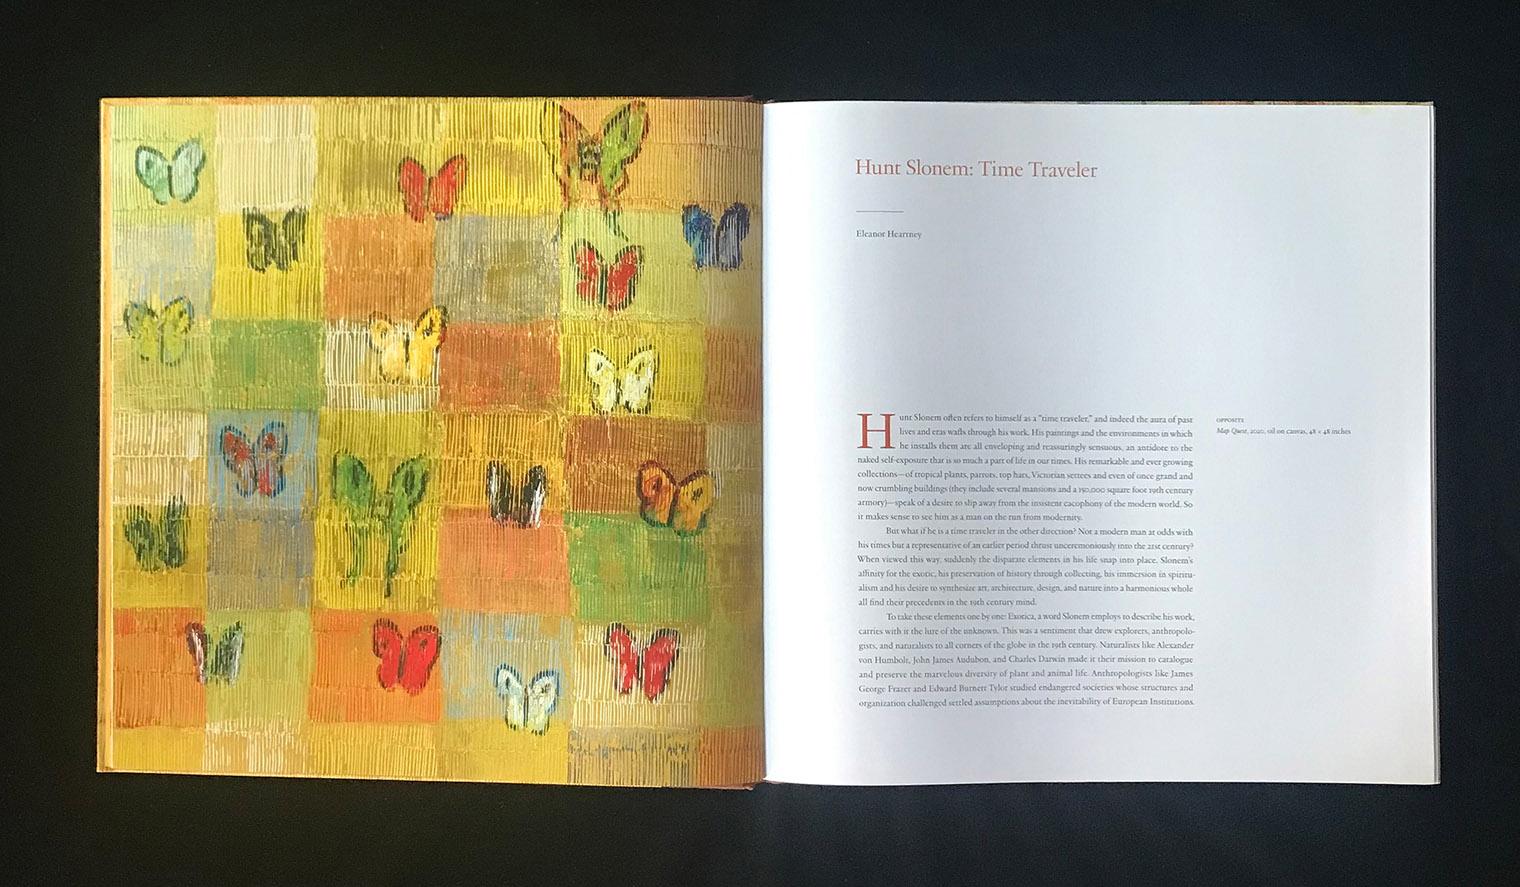 Opener for Hunt Slonem: The Bigger Picture Book